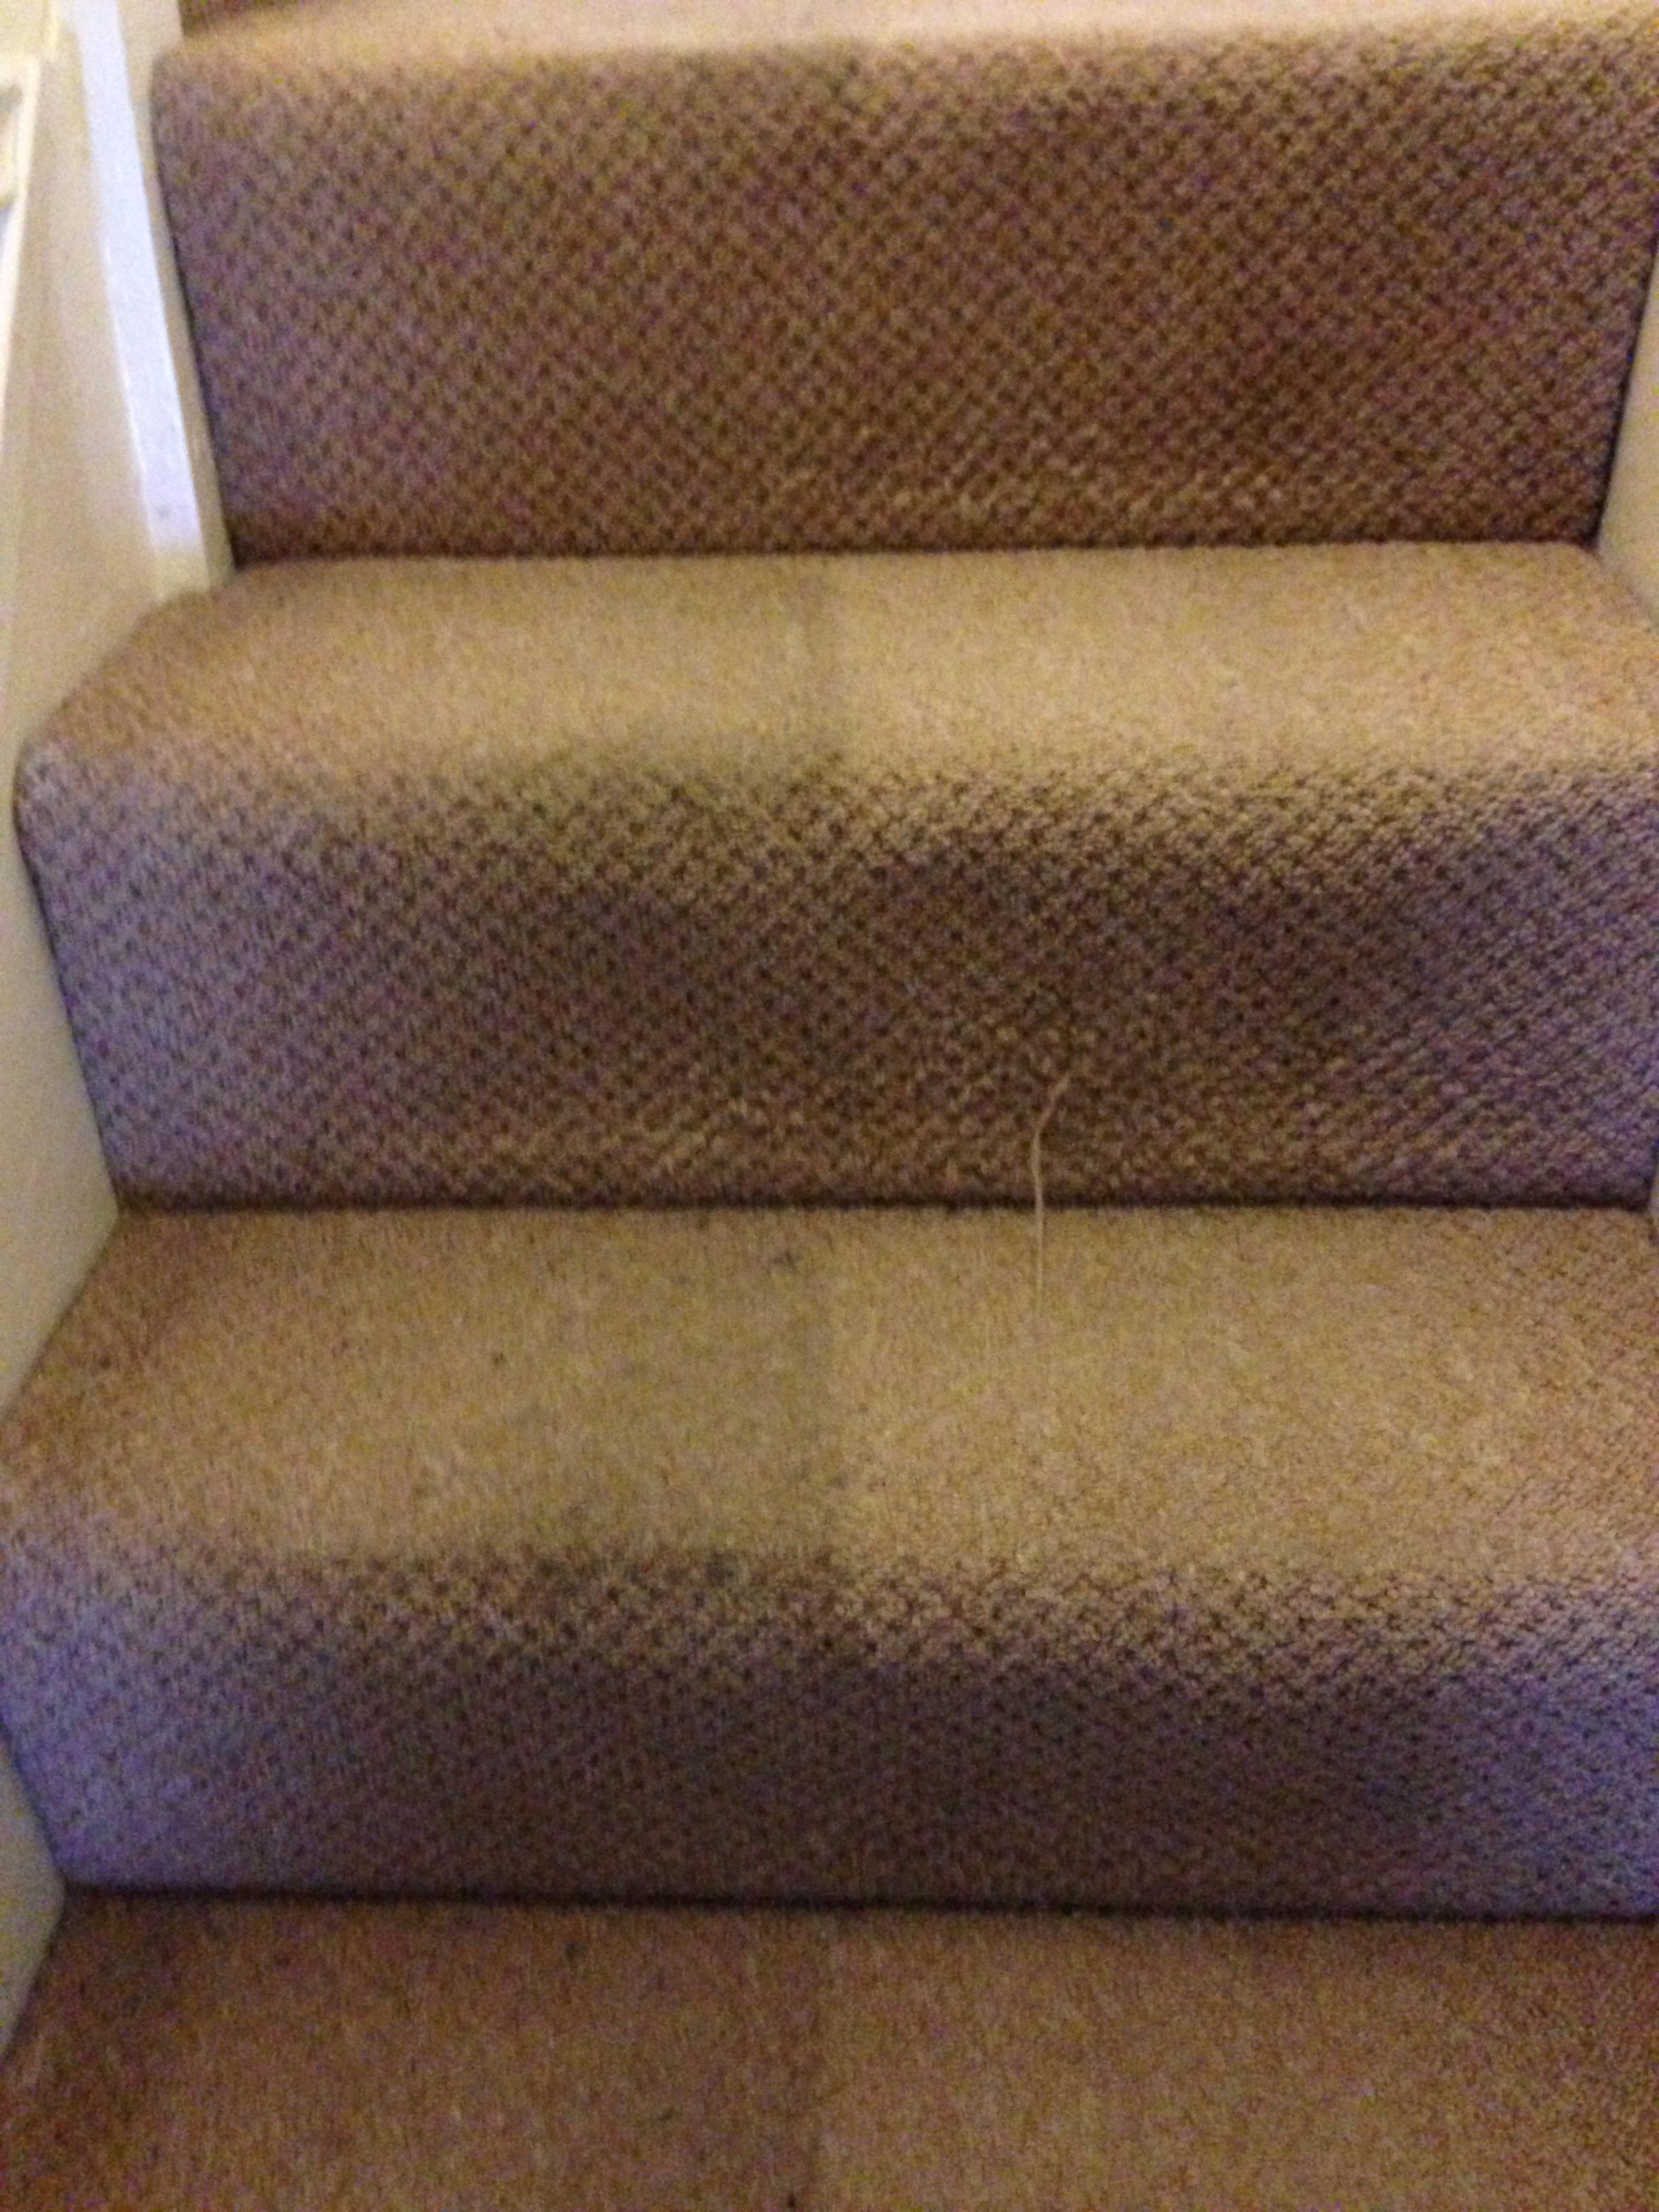 Stairs (1).jpeg